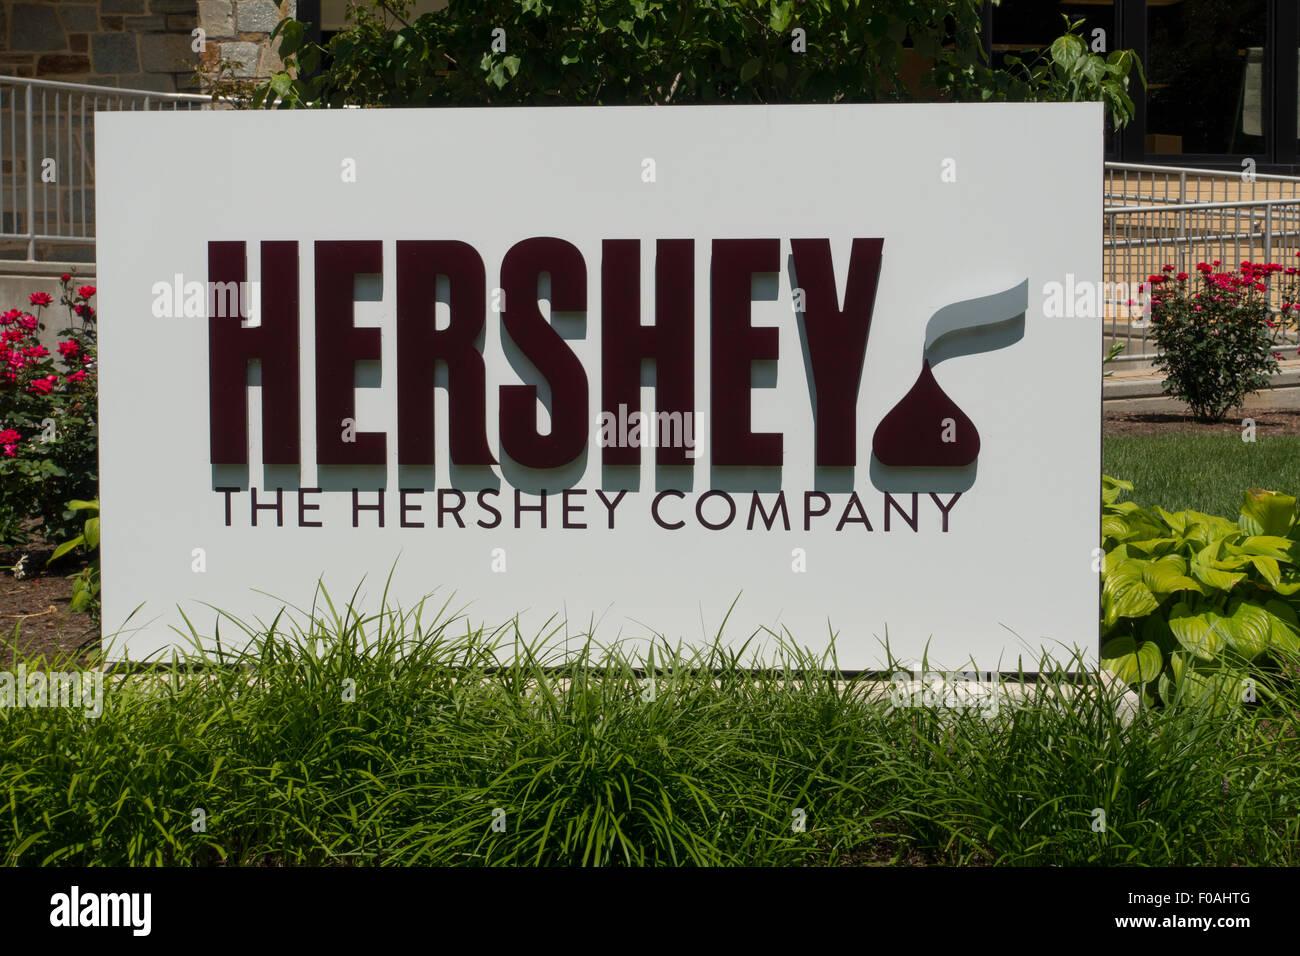 Hershey corporate headquarters in Hershey PA - Stock Image